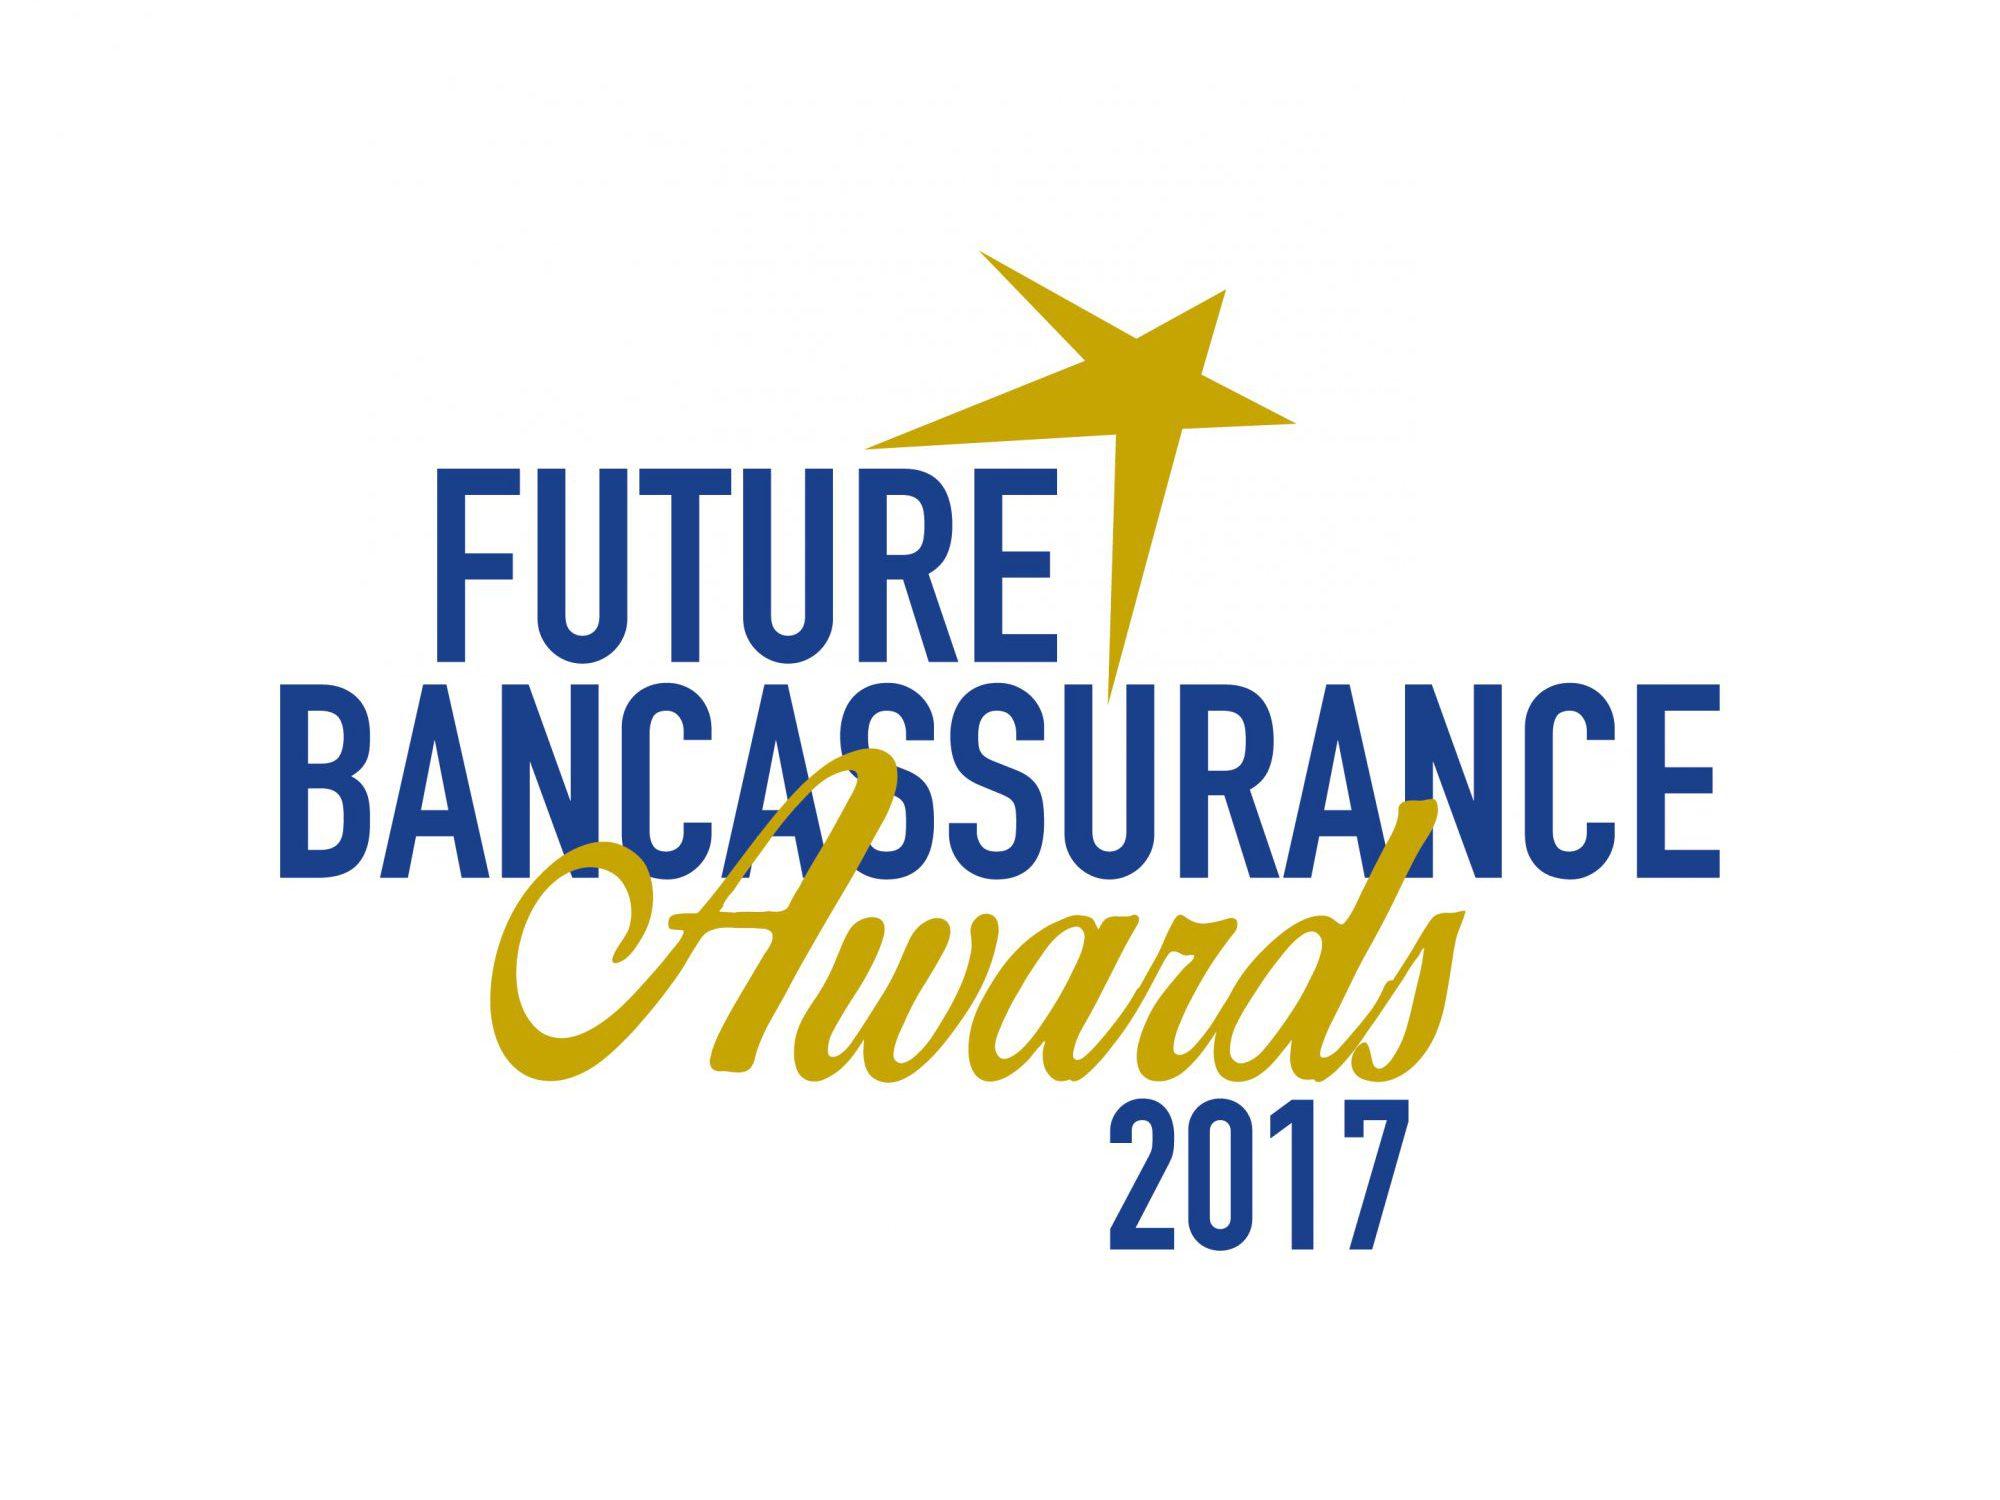 Future Bancassurance Awards 2017, ecco i vincitori